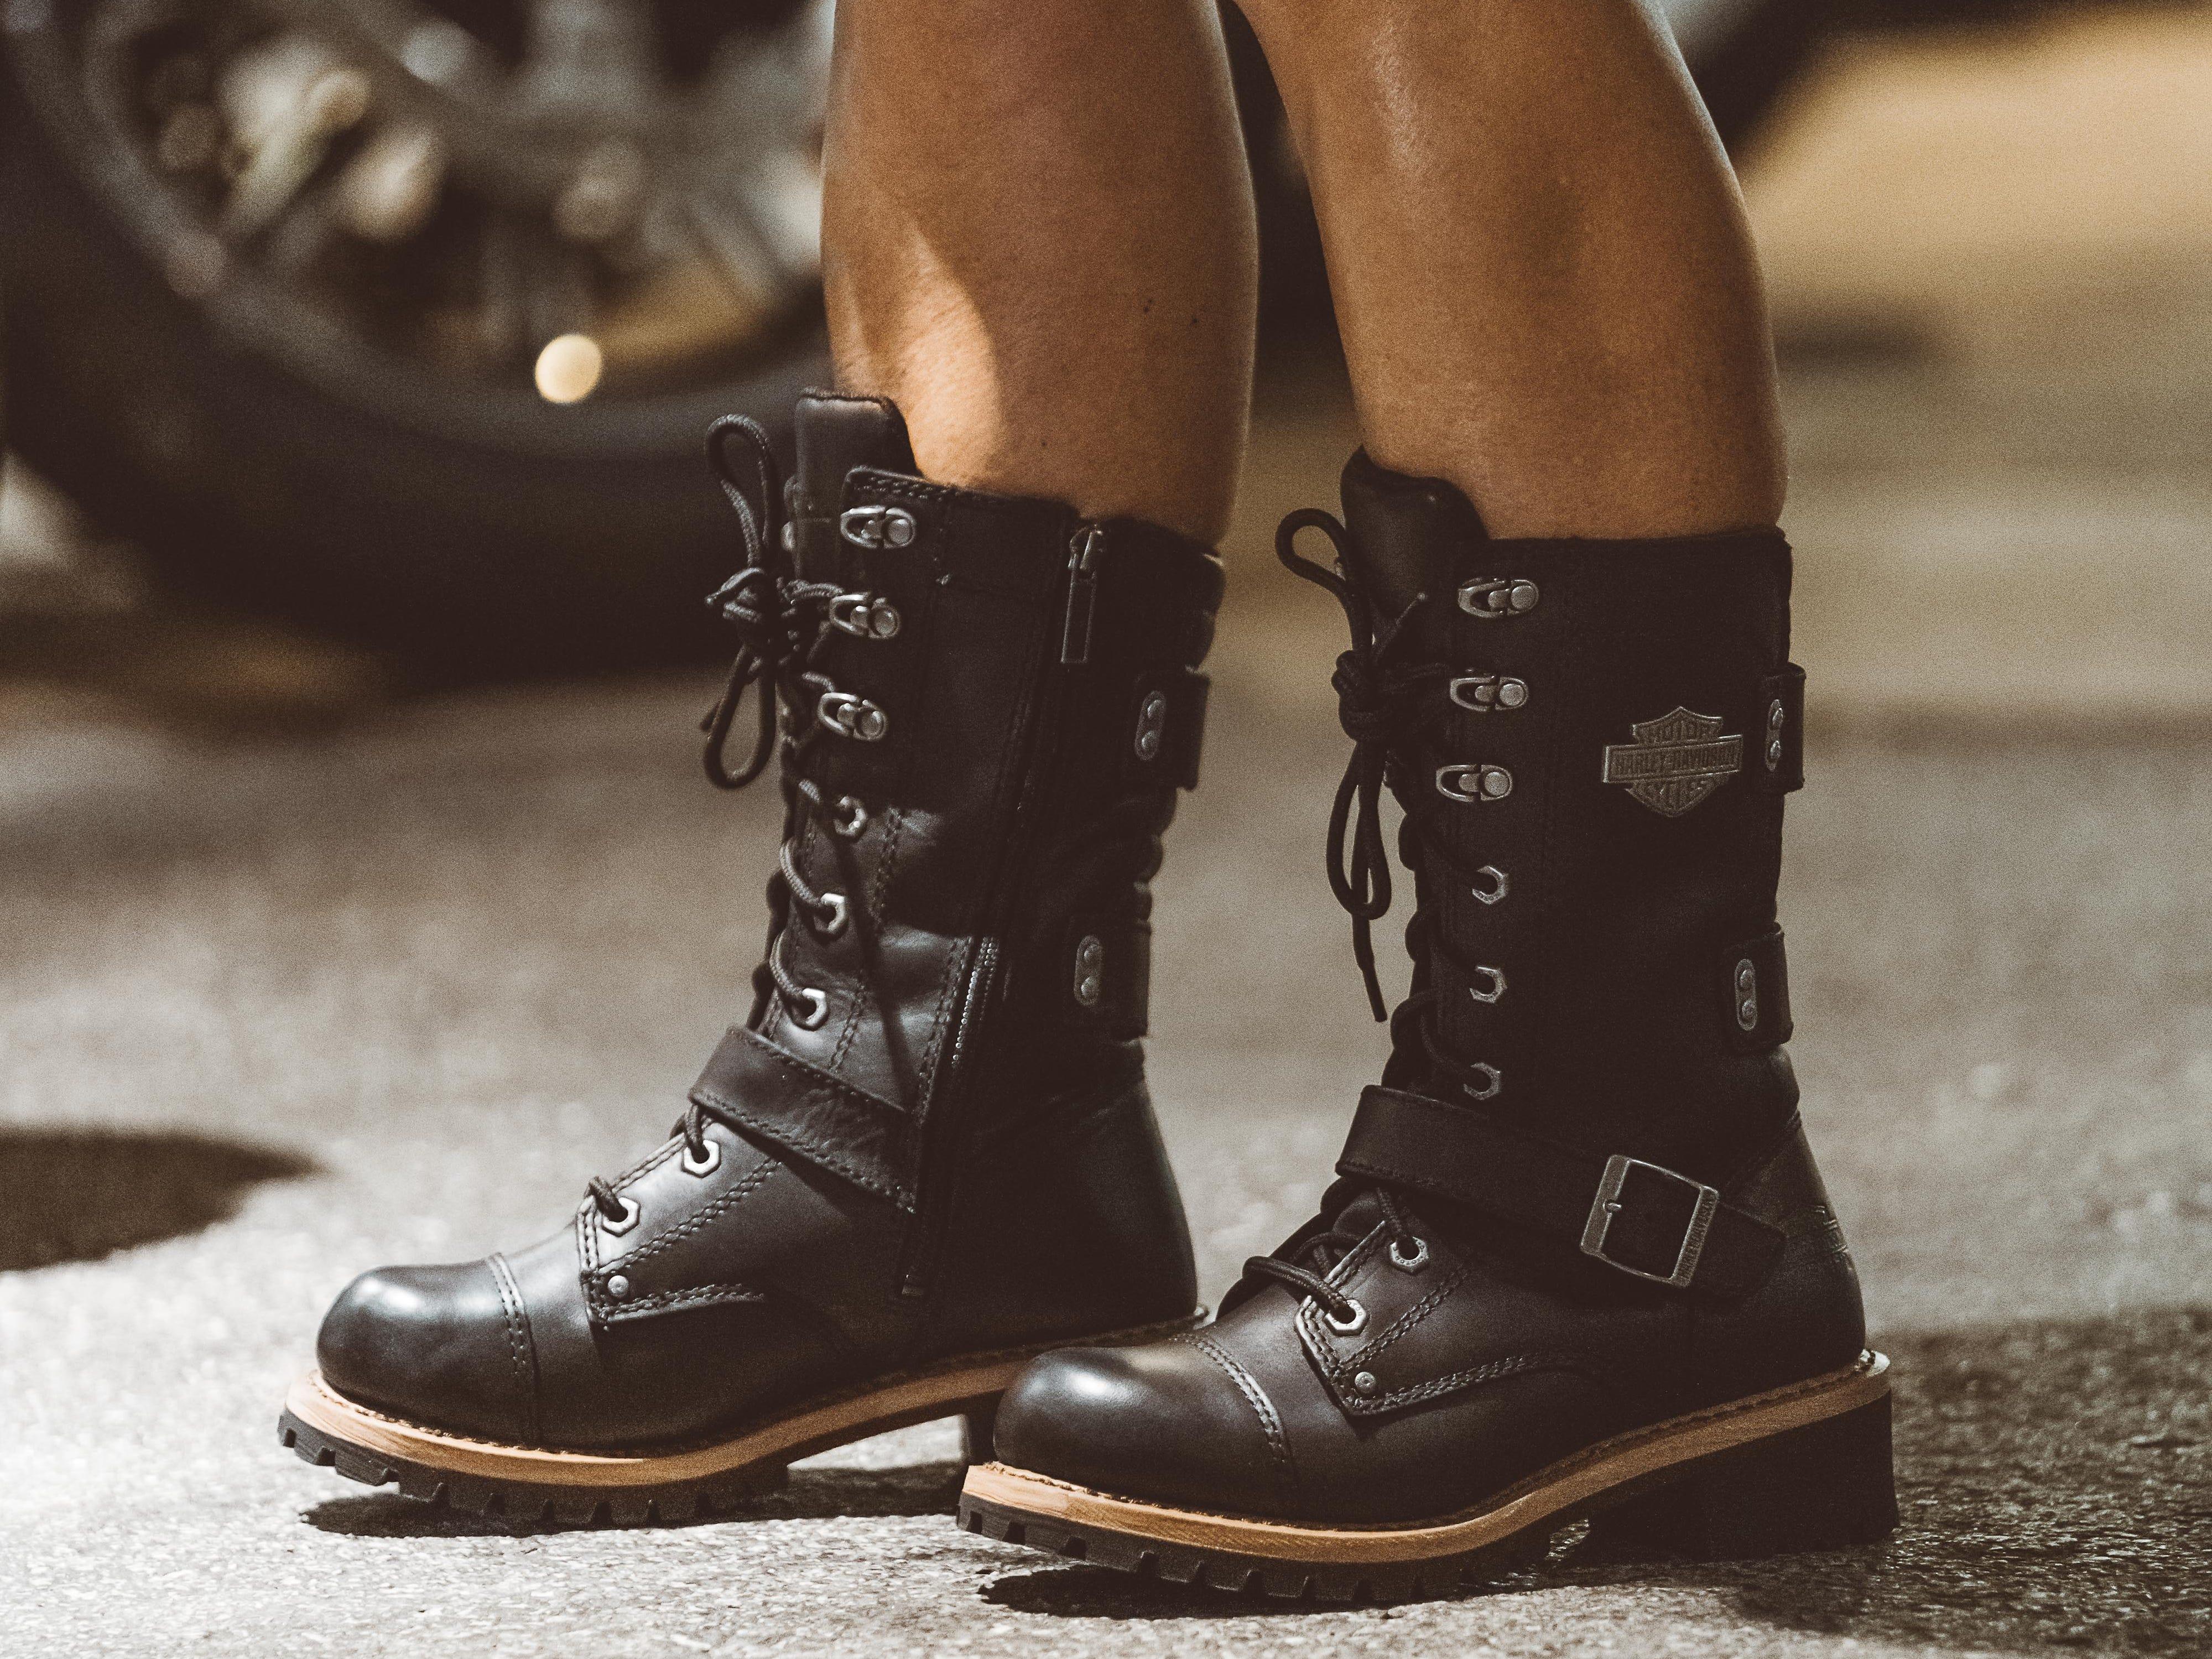 Black Wolverine Alberta boots ($200)